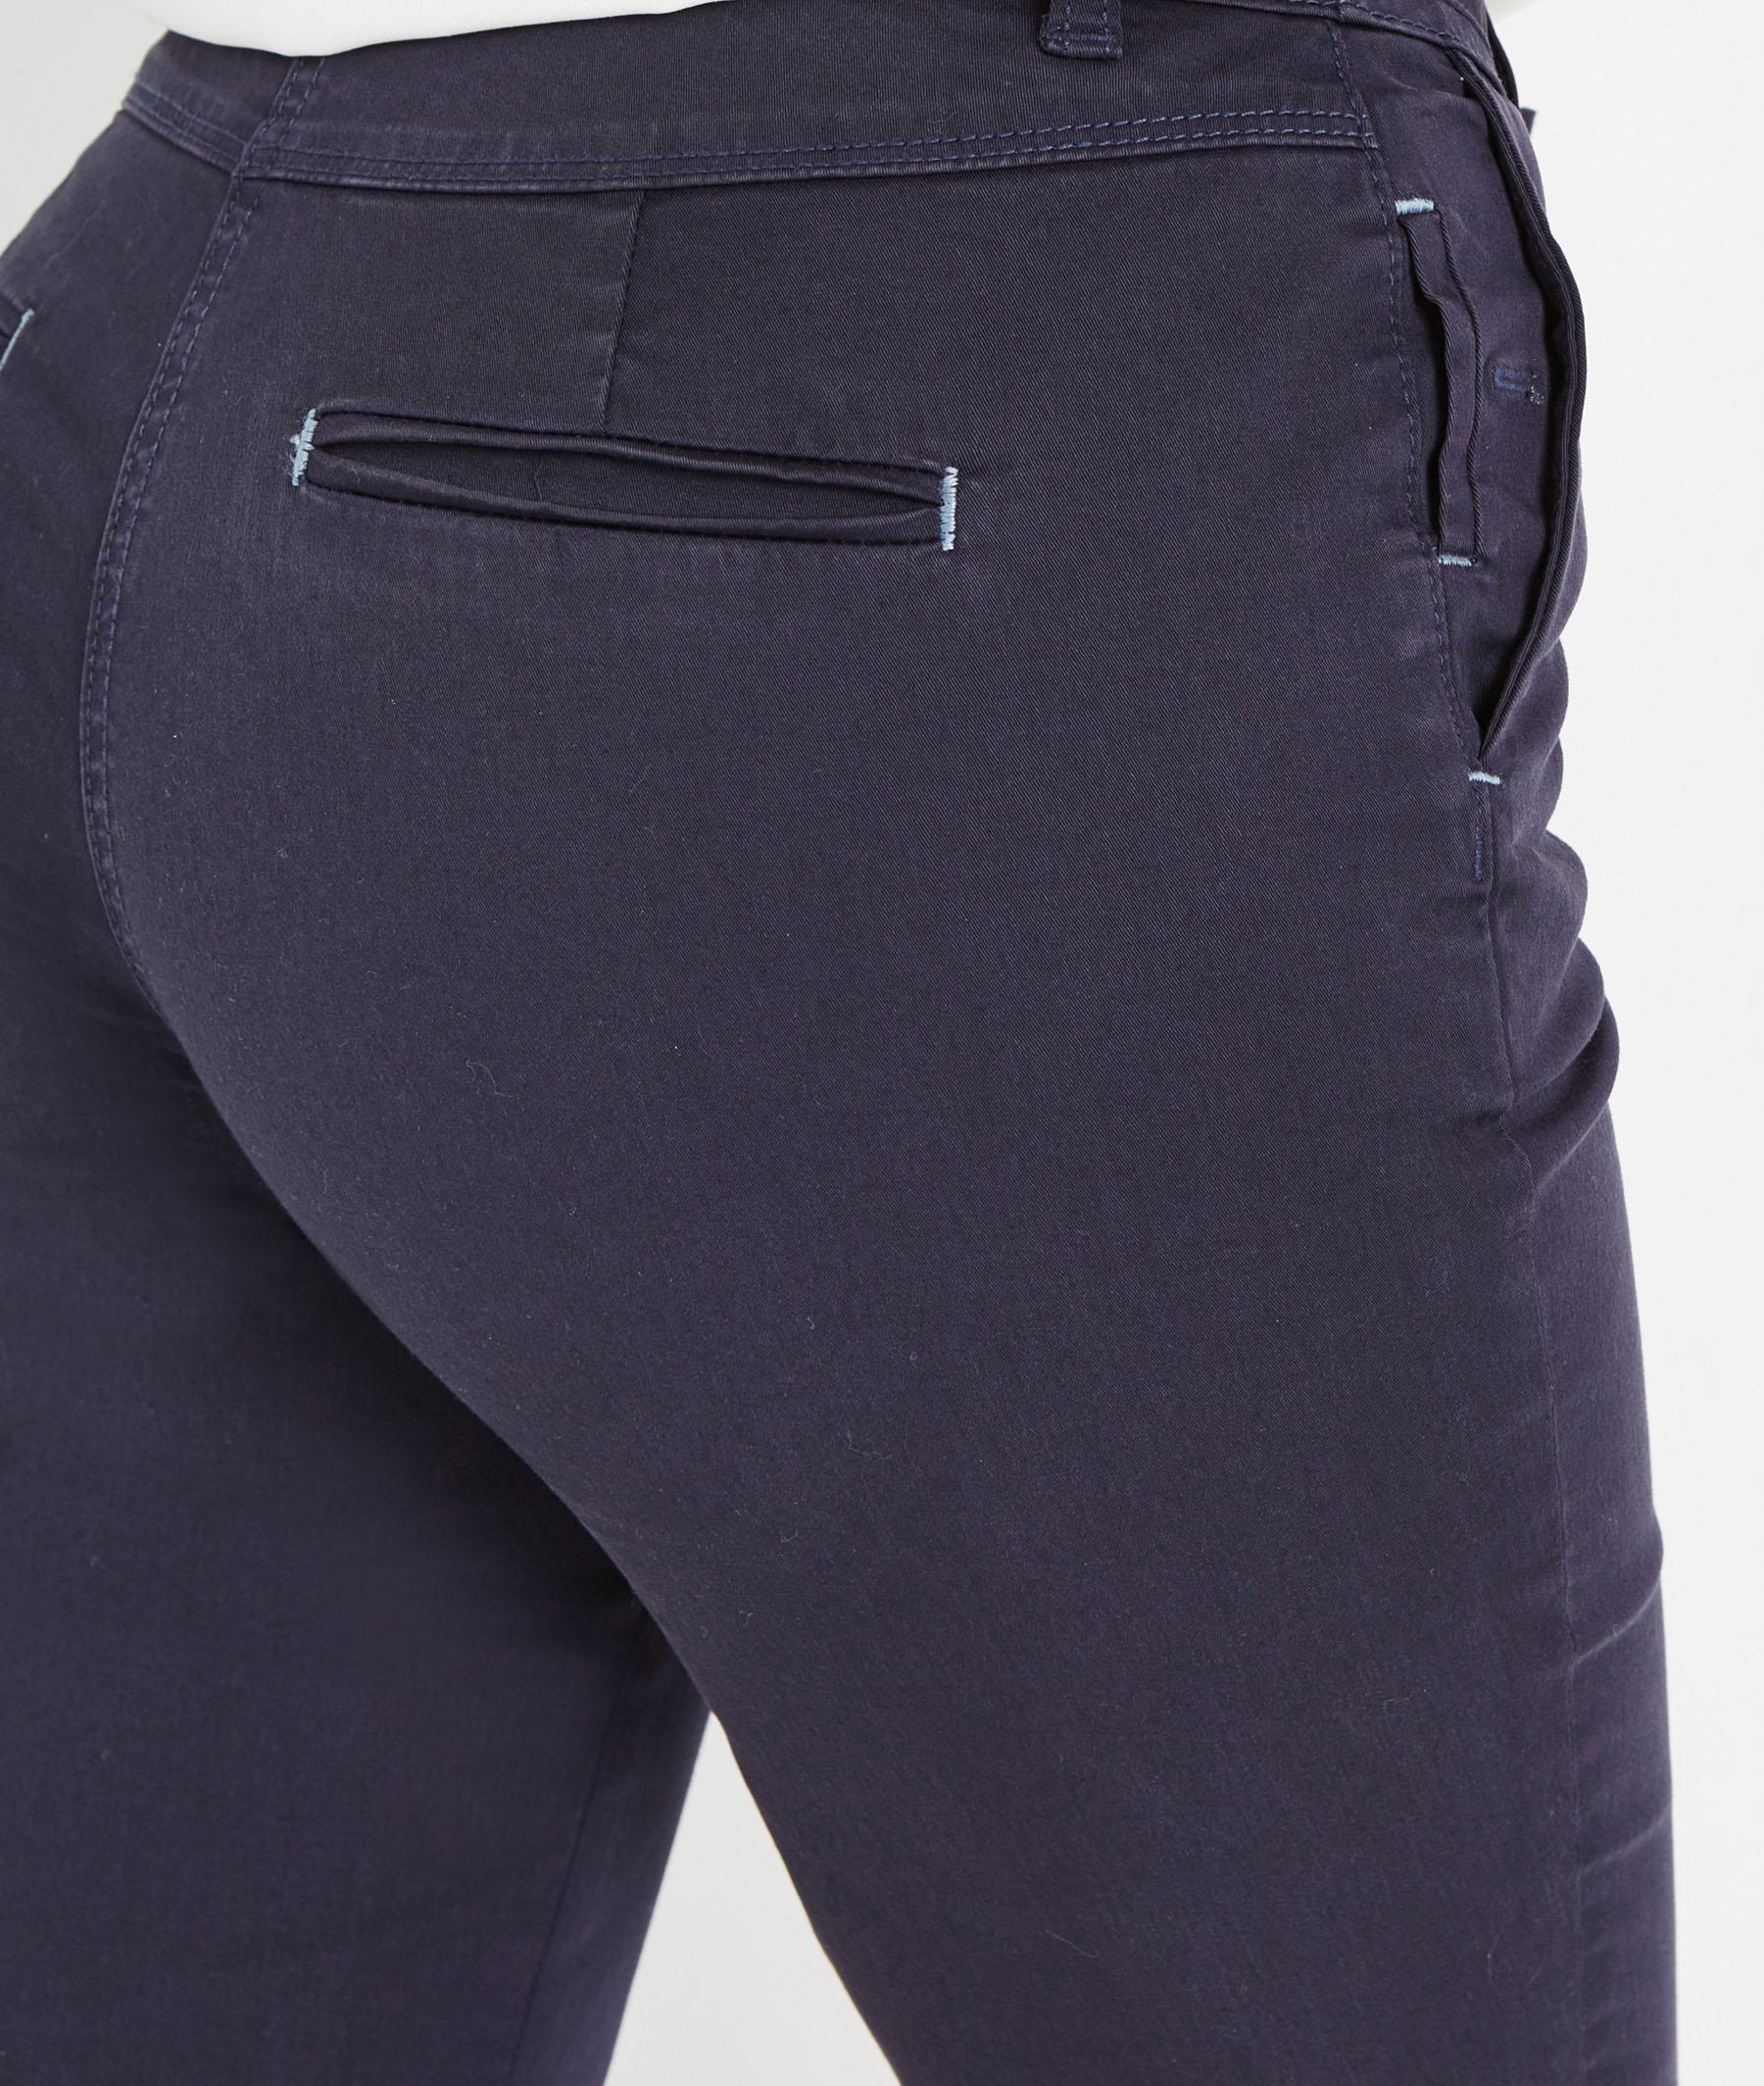 Pantalon femme chino avec ceinture MARINE - Grain de Malice 37a0149b635